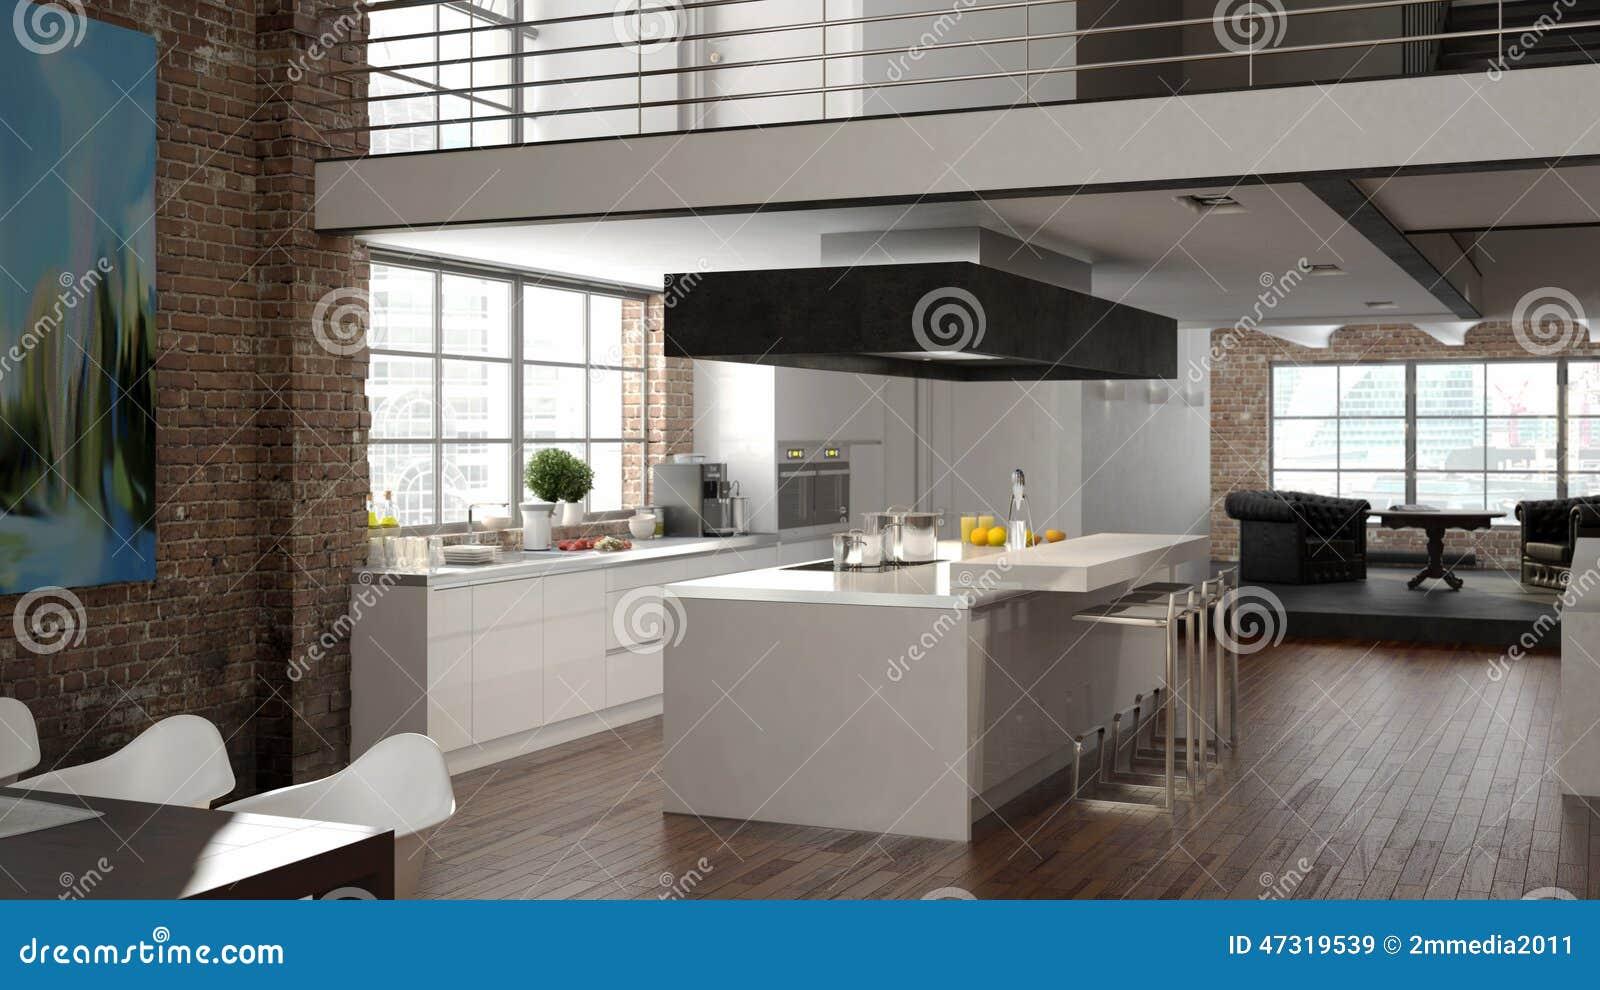 Grenier moderne avec une cuisine rendu 3d illustration for Cuisine 3d bessines